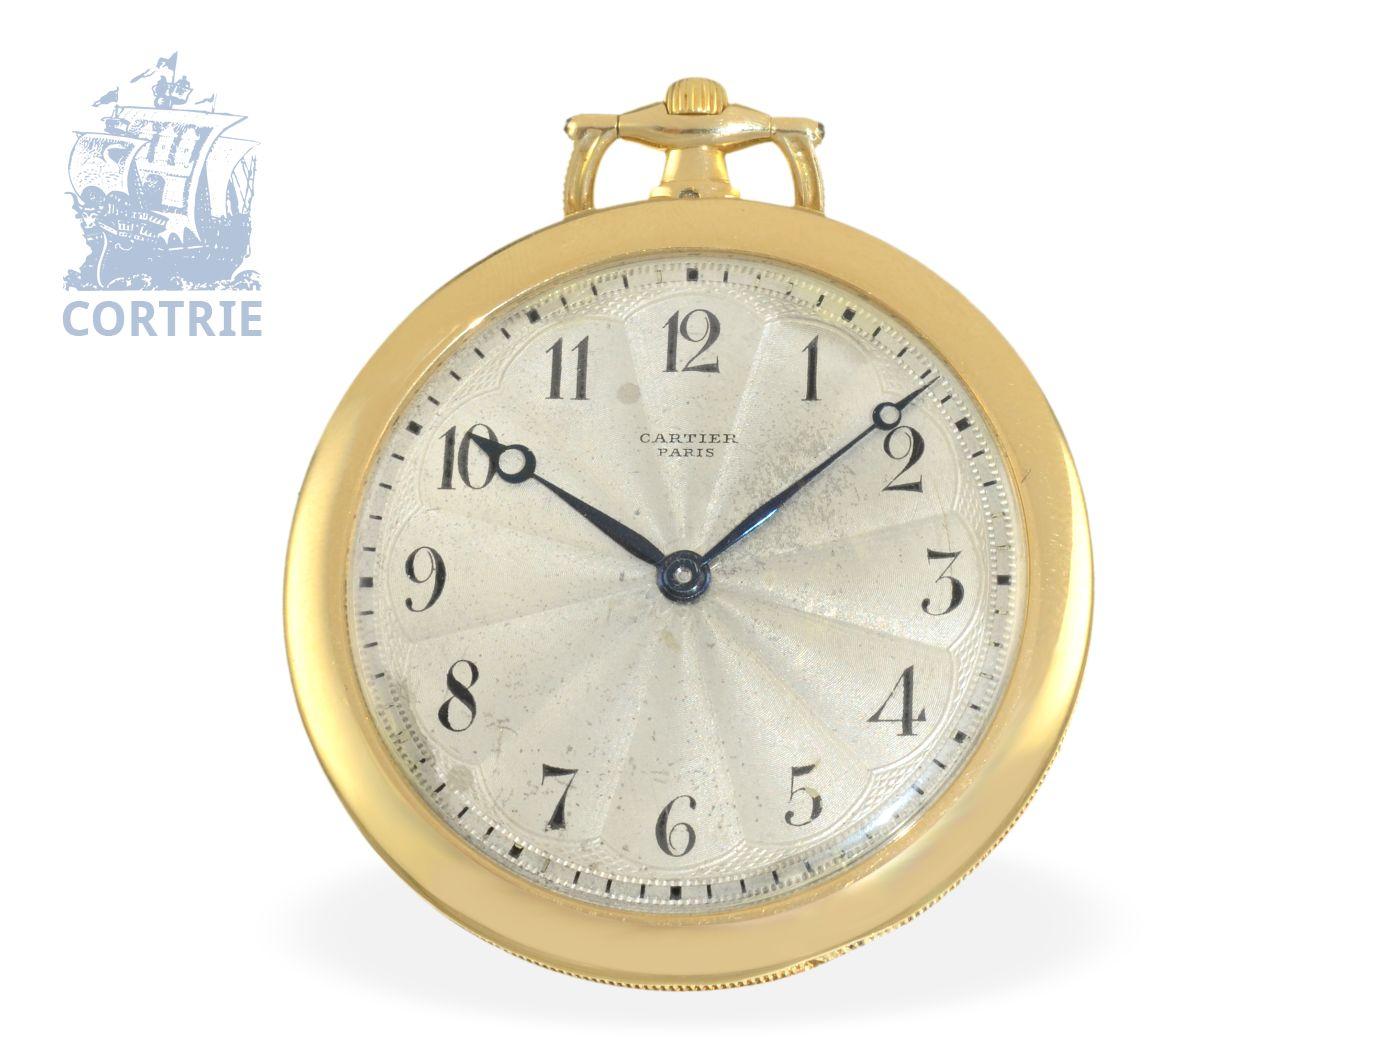 Pocket watch: very flat Art Nouveau dress watch Montre Couteau, original Cartier ca. 1910-